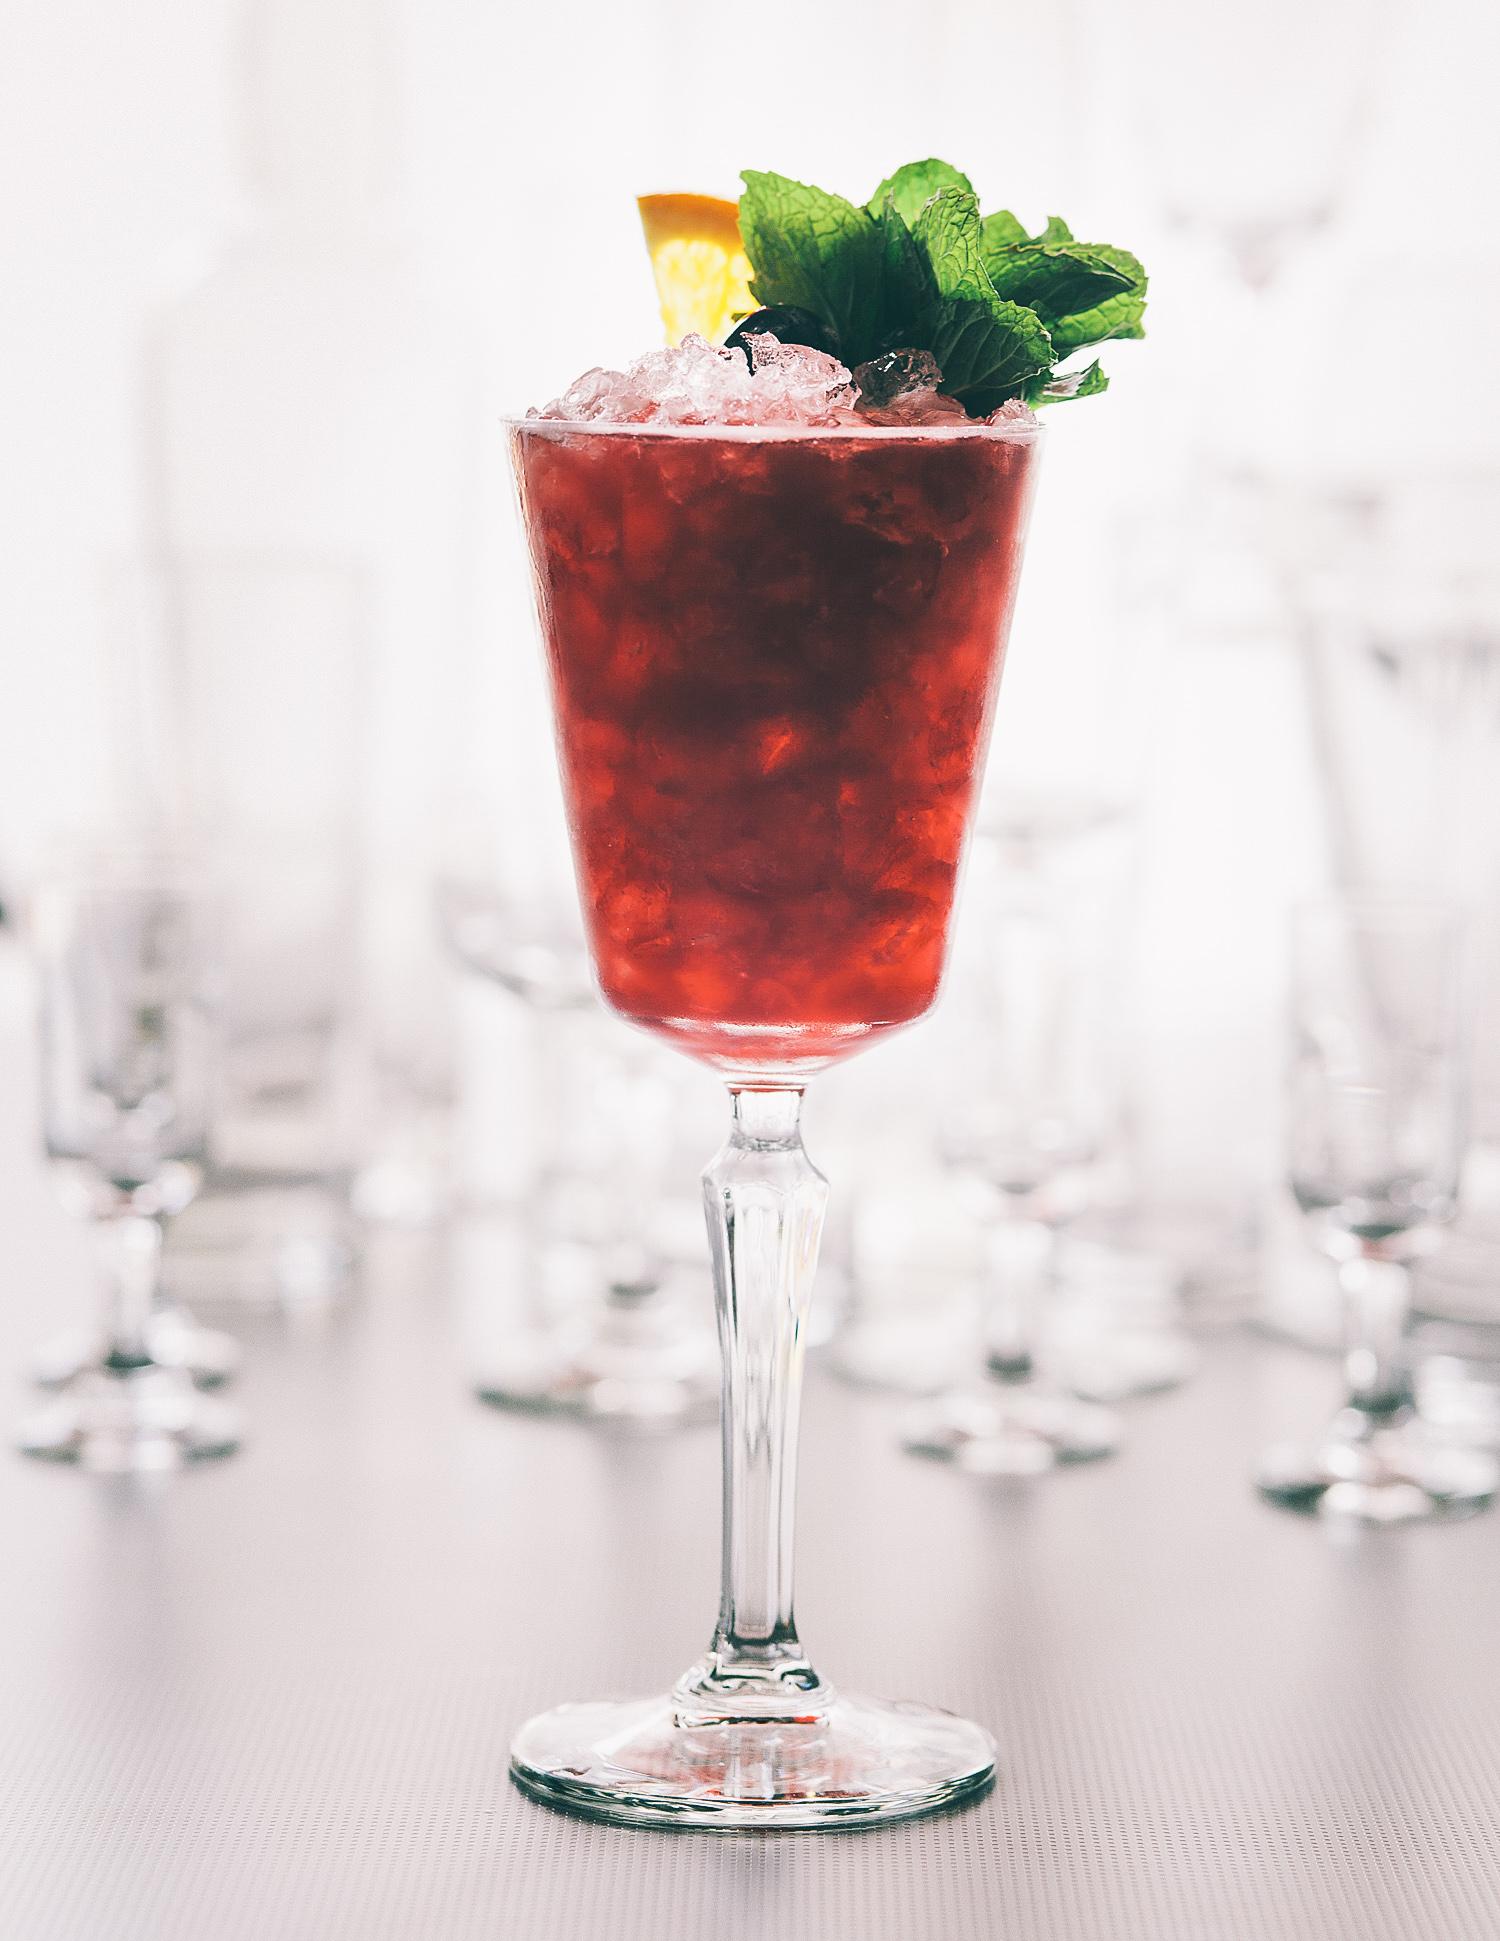 Craft Cocktail photographed by Adam DeTour